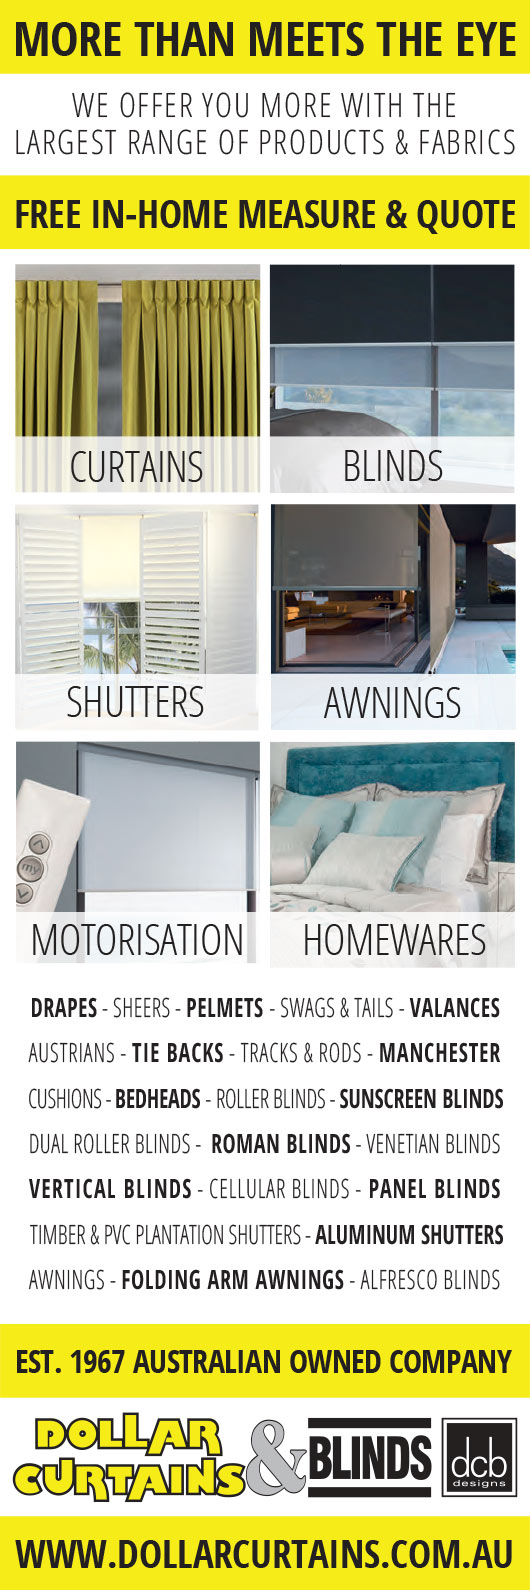 Dollar Curtains & Blinds - Blinds - 6 Ormond Rd - East Geelong